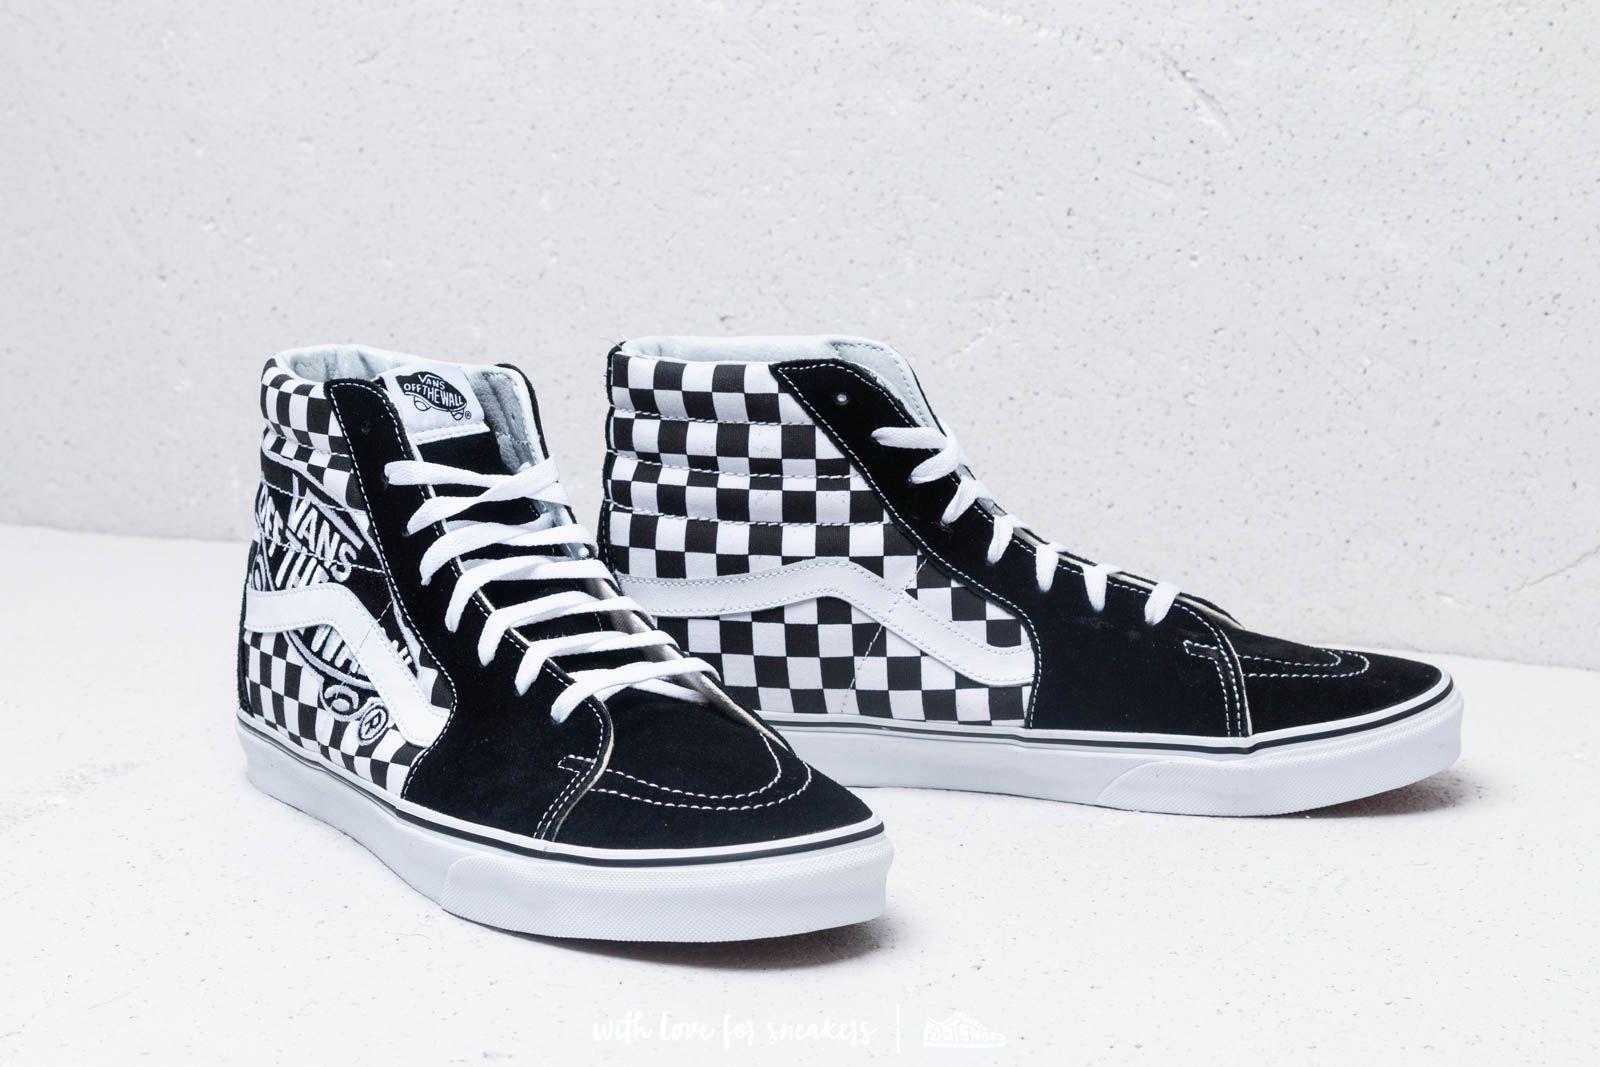 Vans Sk8 Hi (Vans Patch) Black True White | Footshop